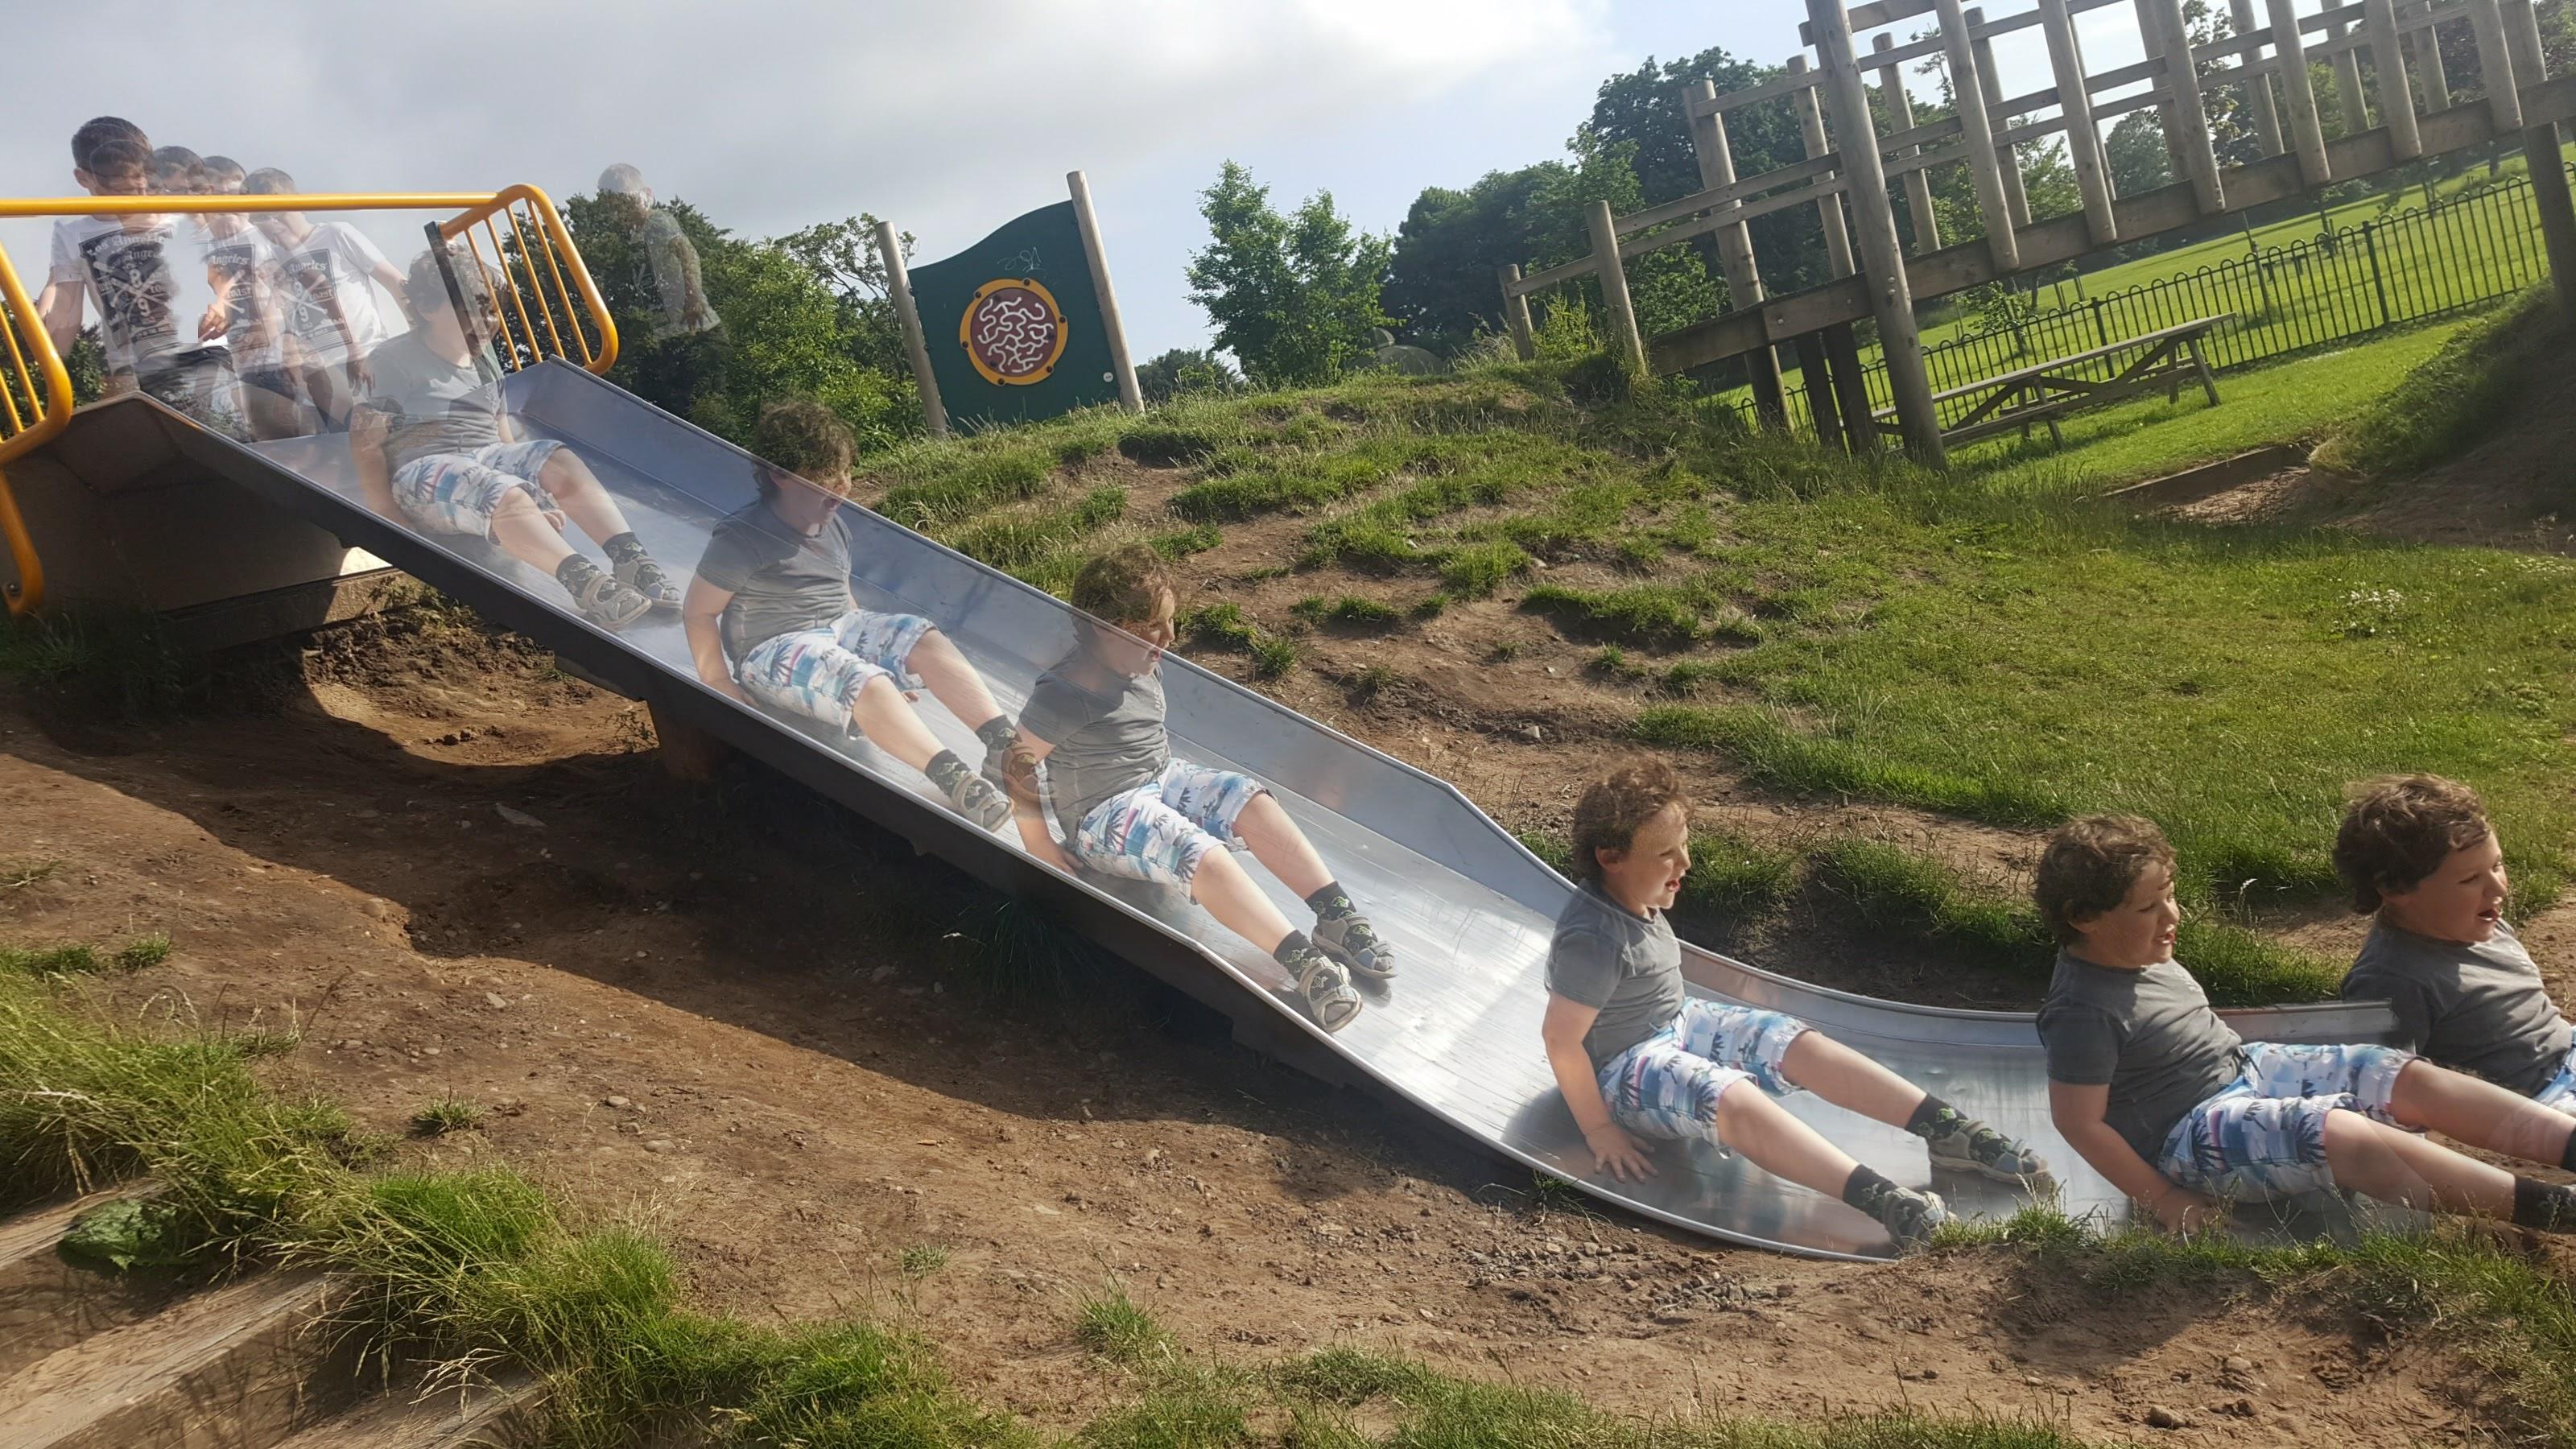 Multiple Me on the Slide